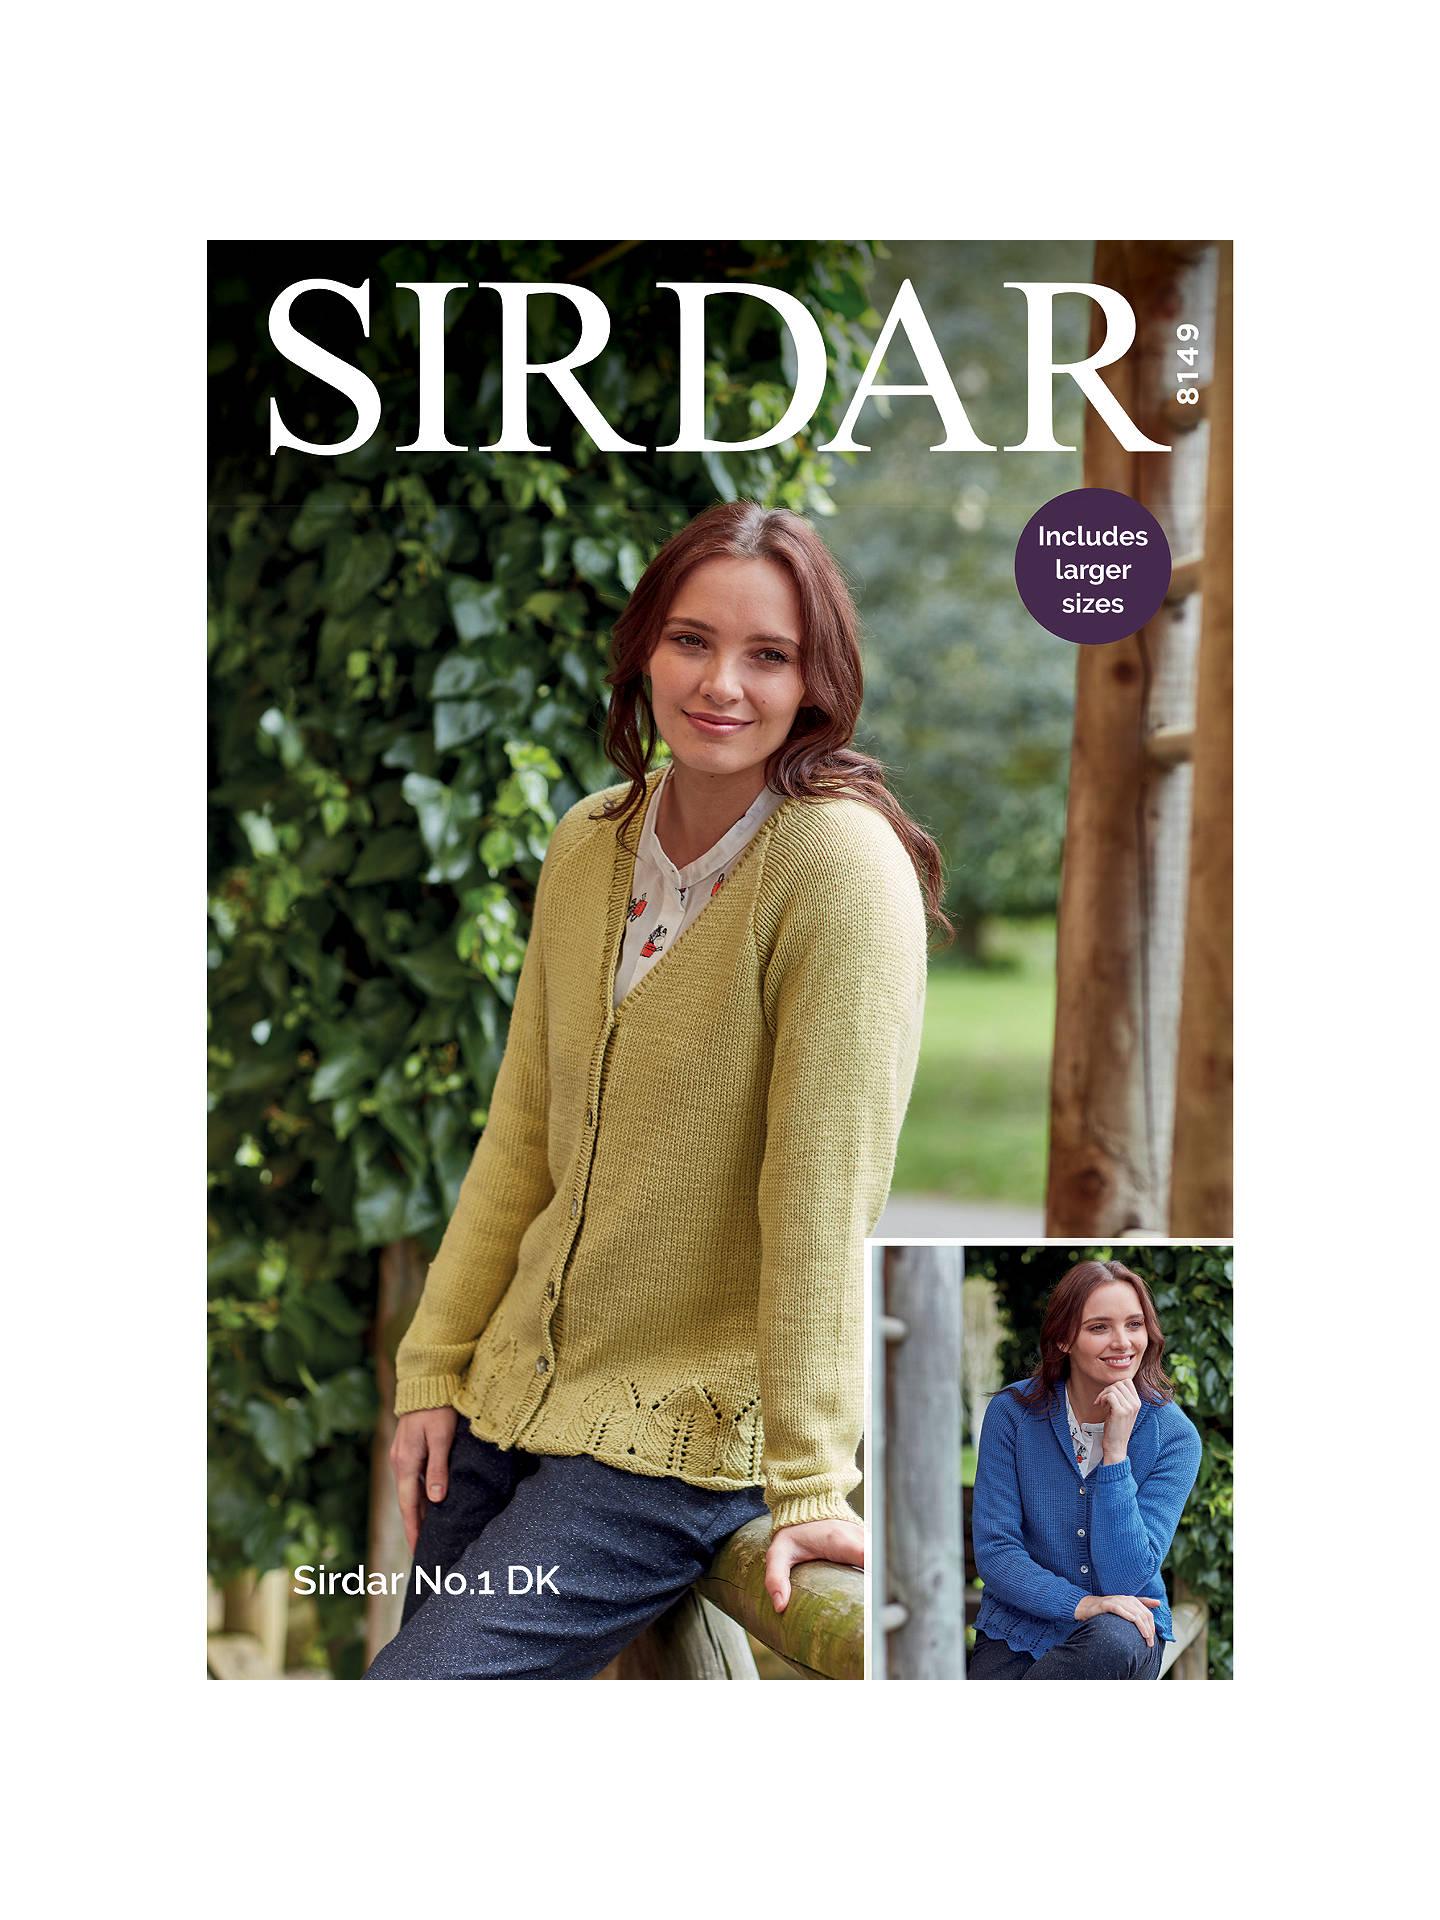 d07b5f04a Buy Sirdar No.1 DK Cardigans Knitting Pattern